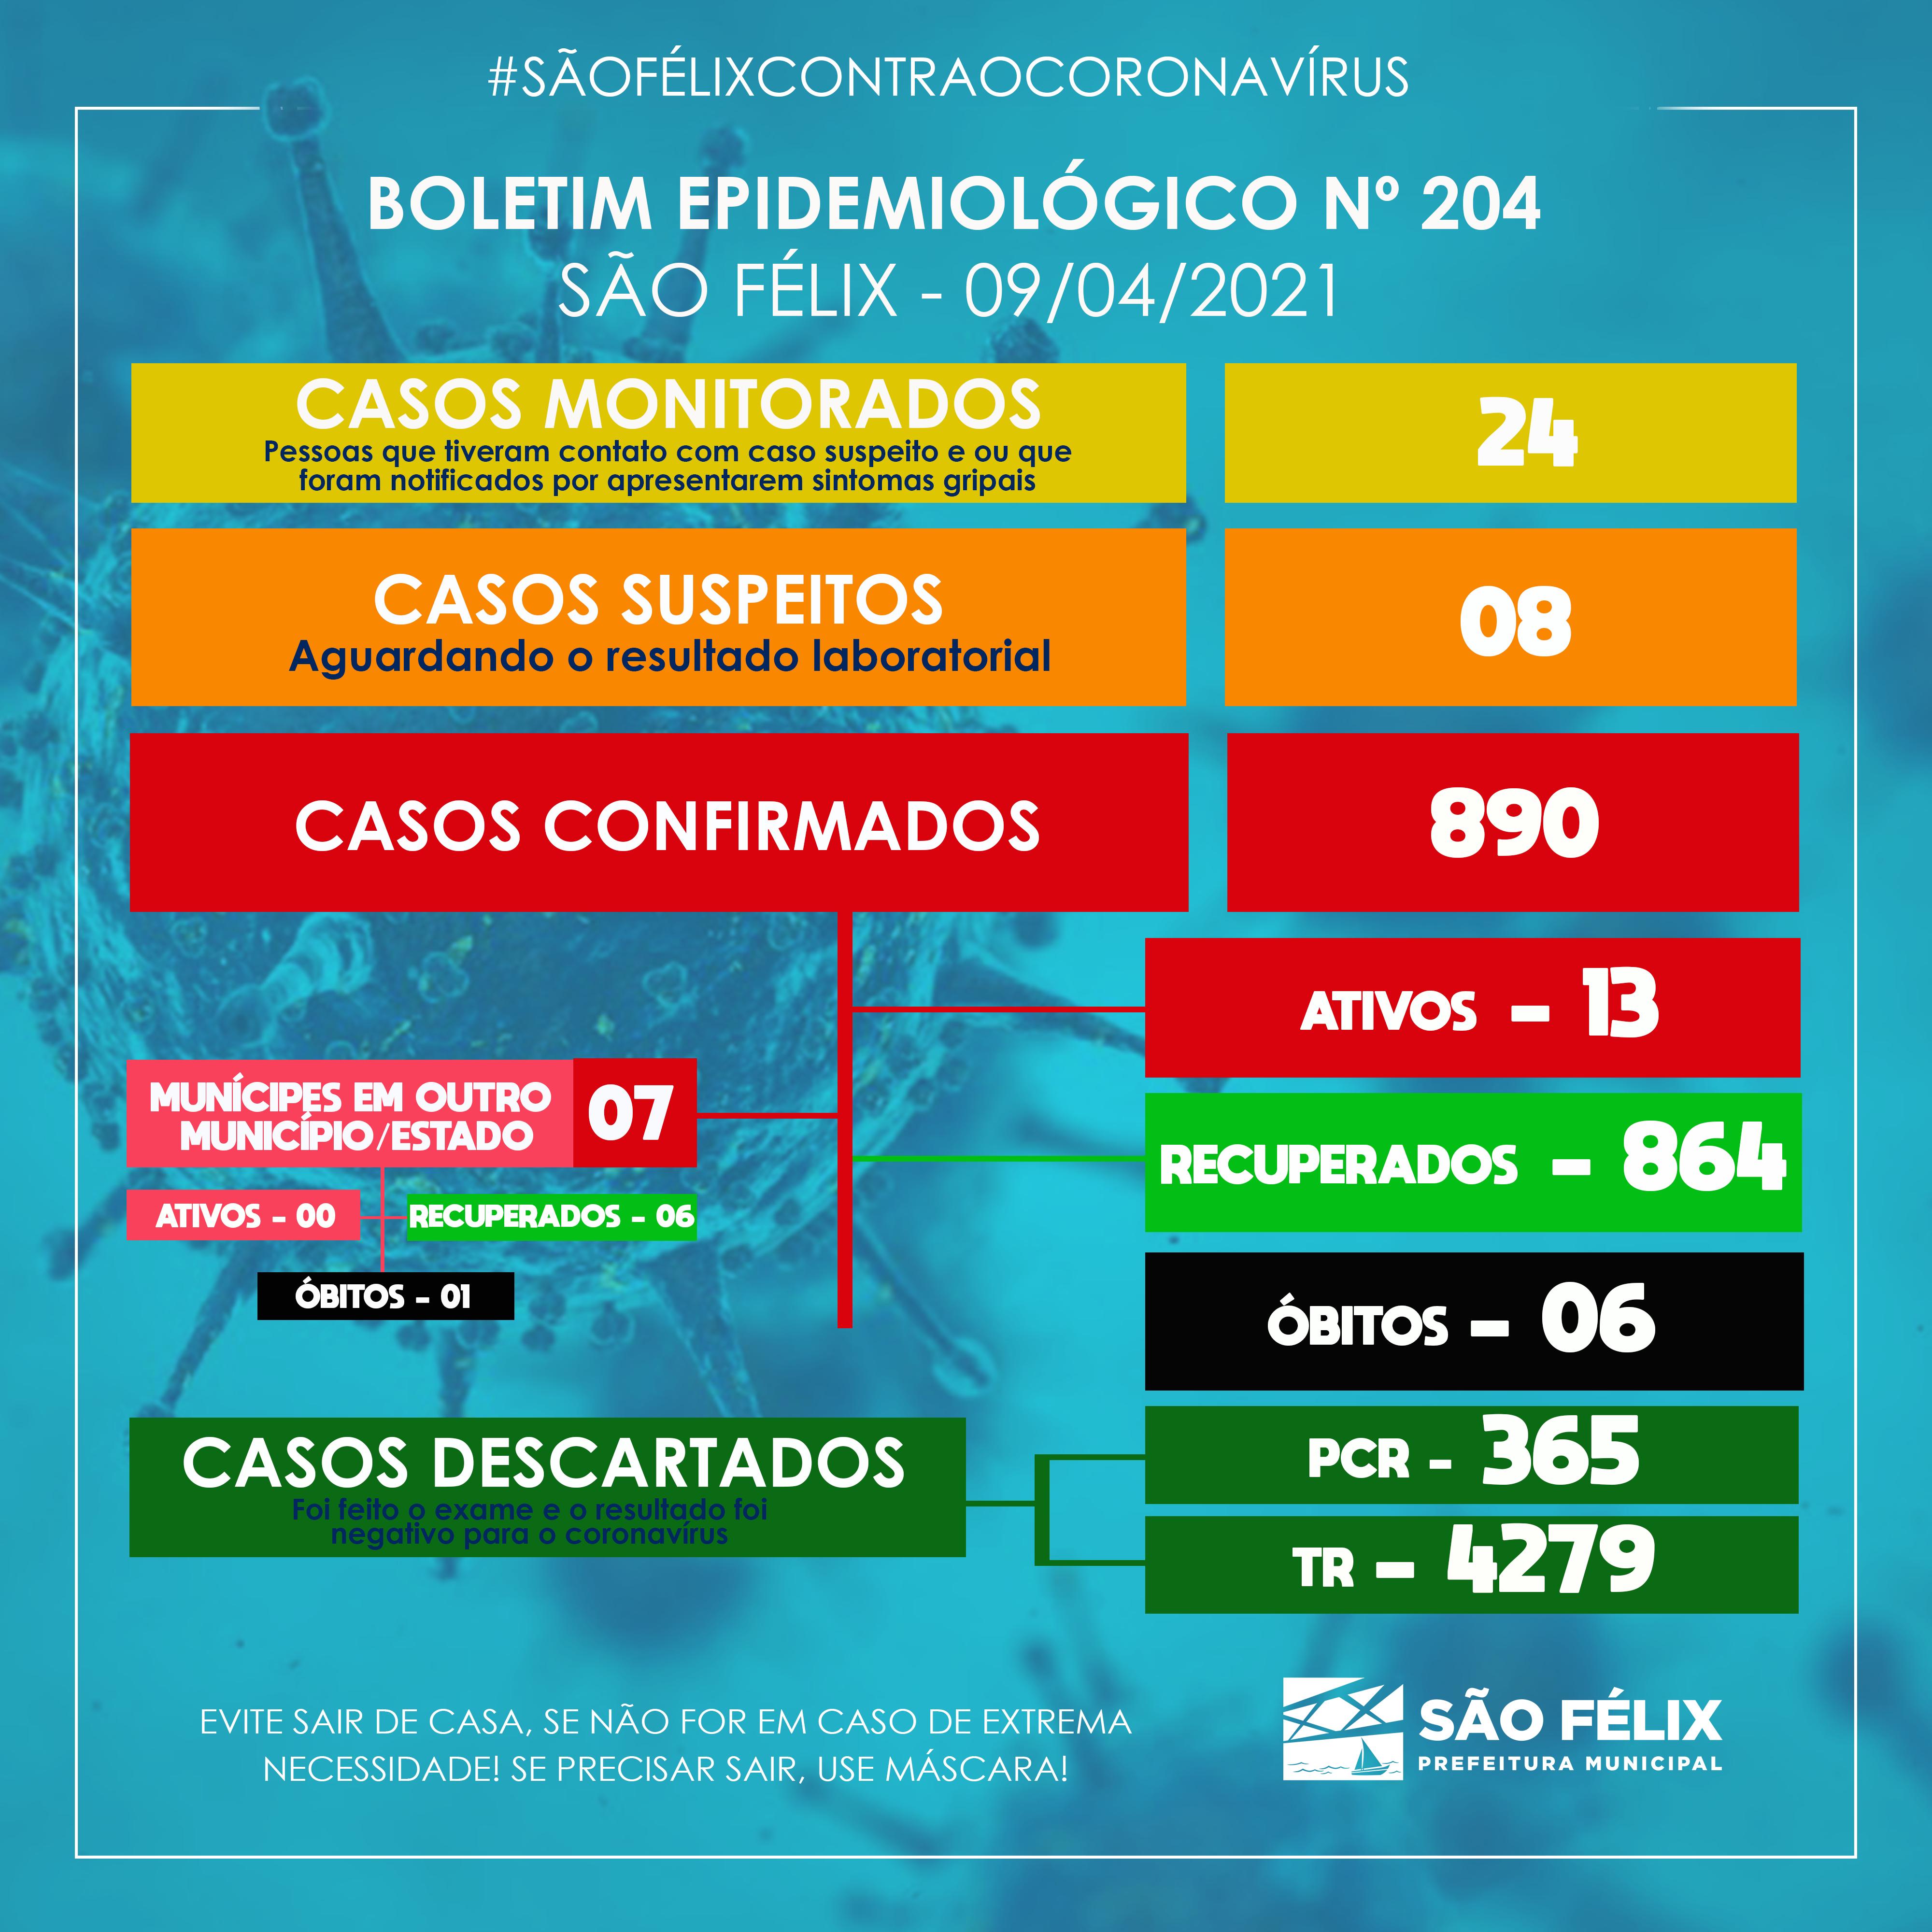 BOLETIM EPIDEMIOLÓGICO Nº 204